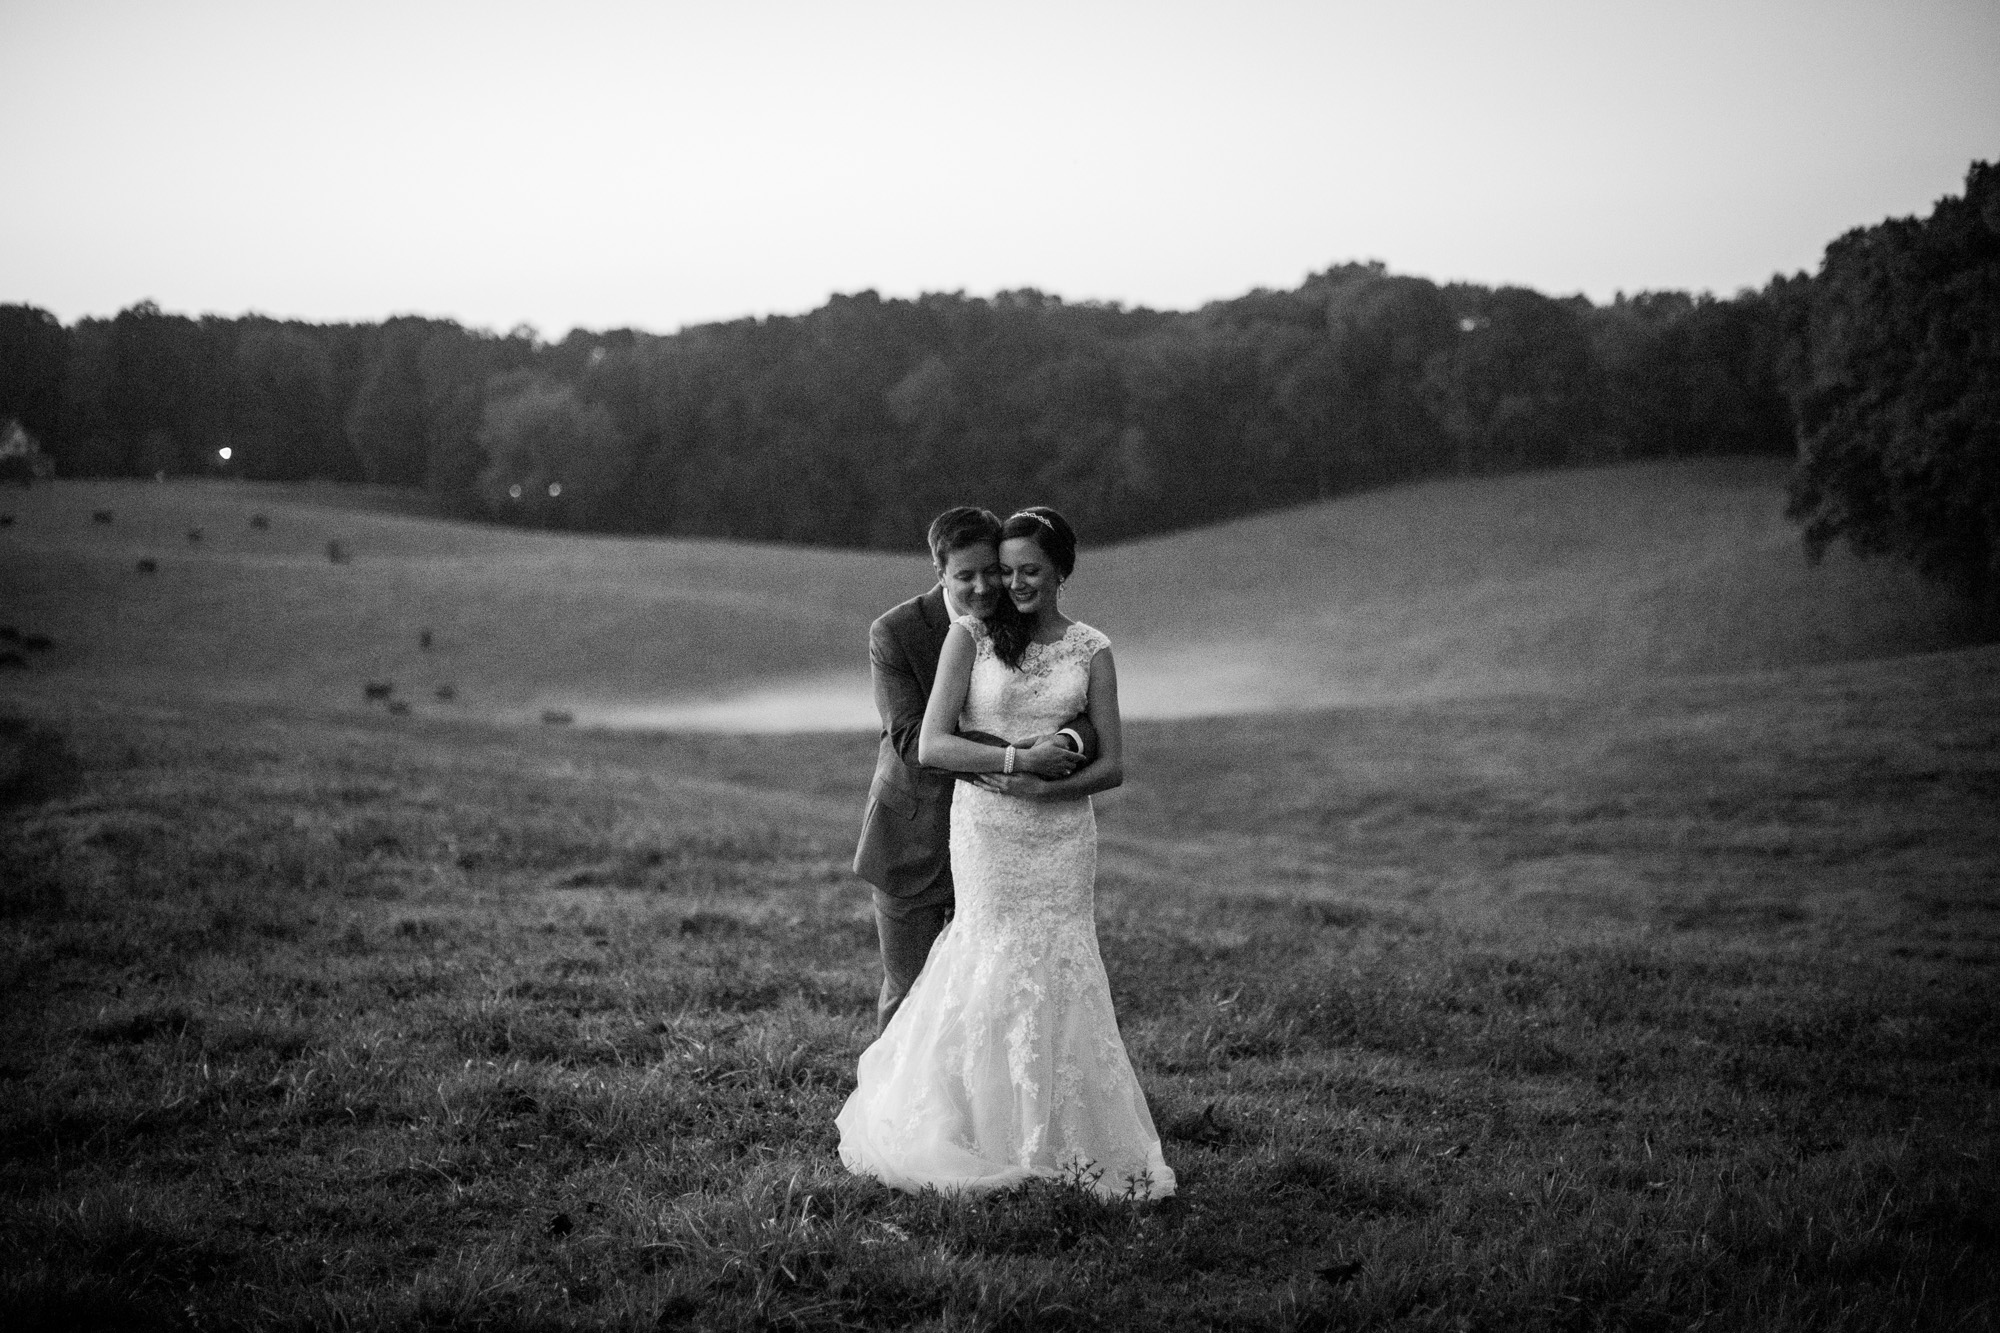 Seriously_Sabrina_Photography_Bowling_Green_Kentucky_Highland_Stables_Wedding_Wolff147.jpg